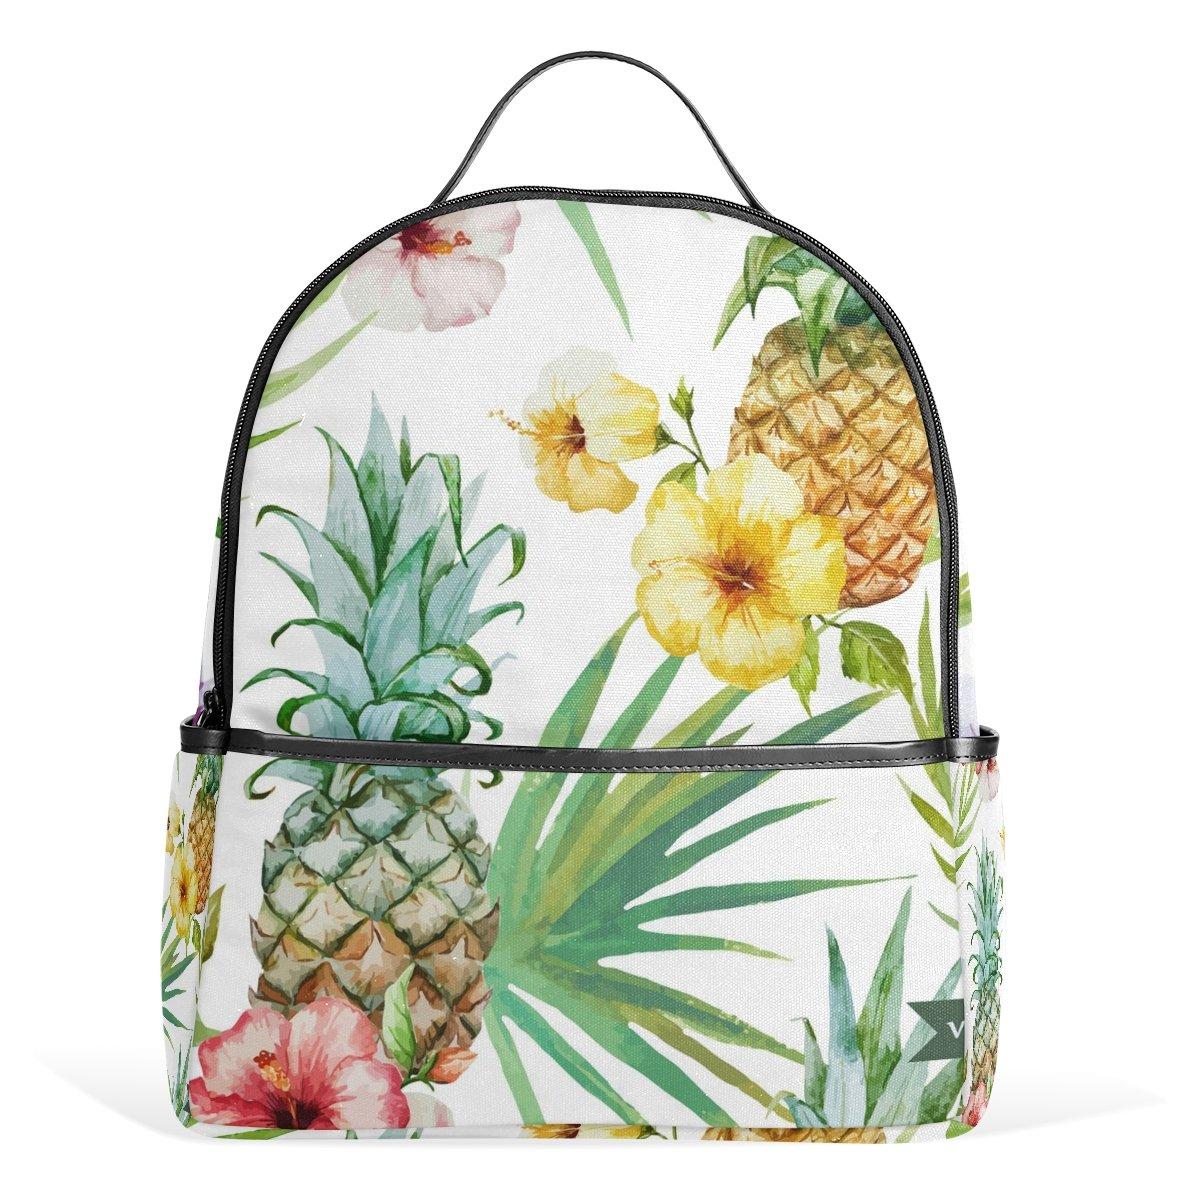 JSTeL RainforestリーフフラワーパイナップルスクールバックパックforボーイズGirls Bookbag   B01MU2WS6U